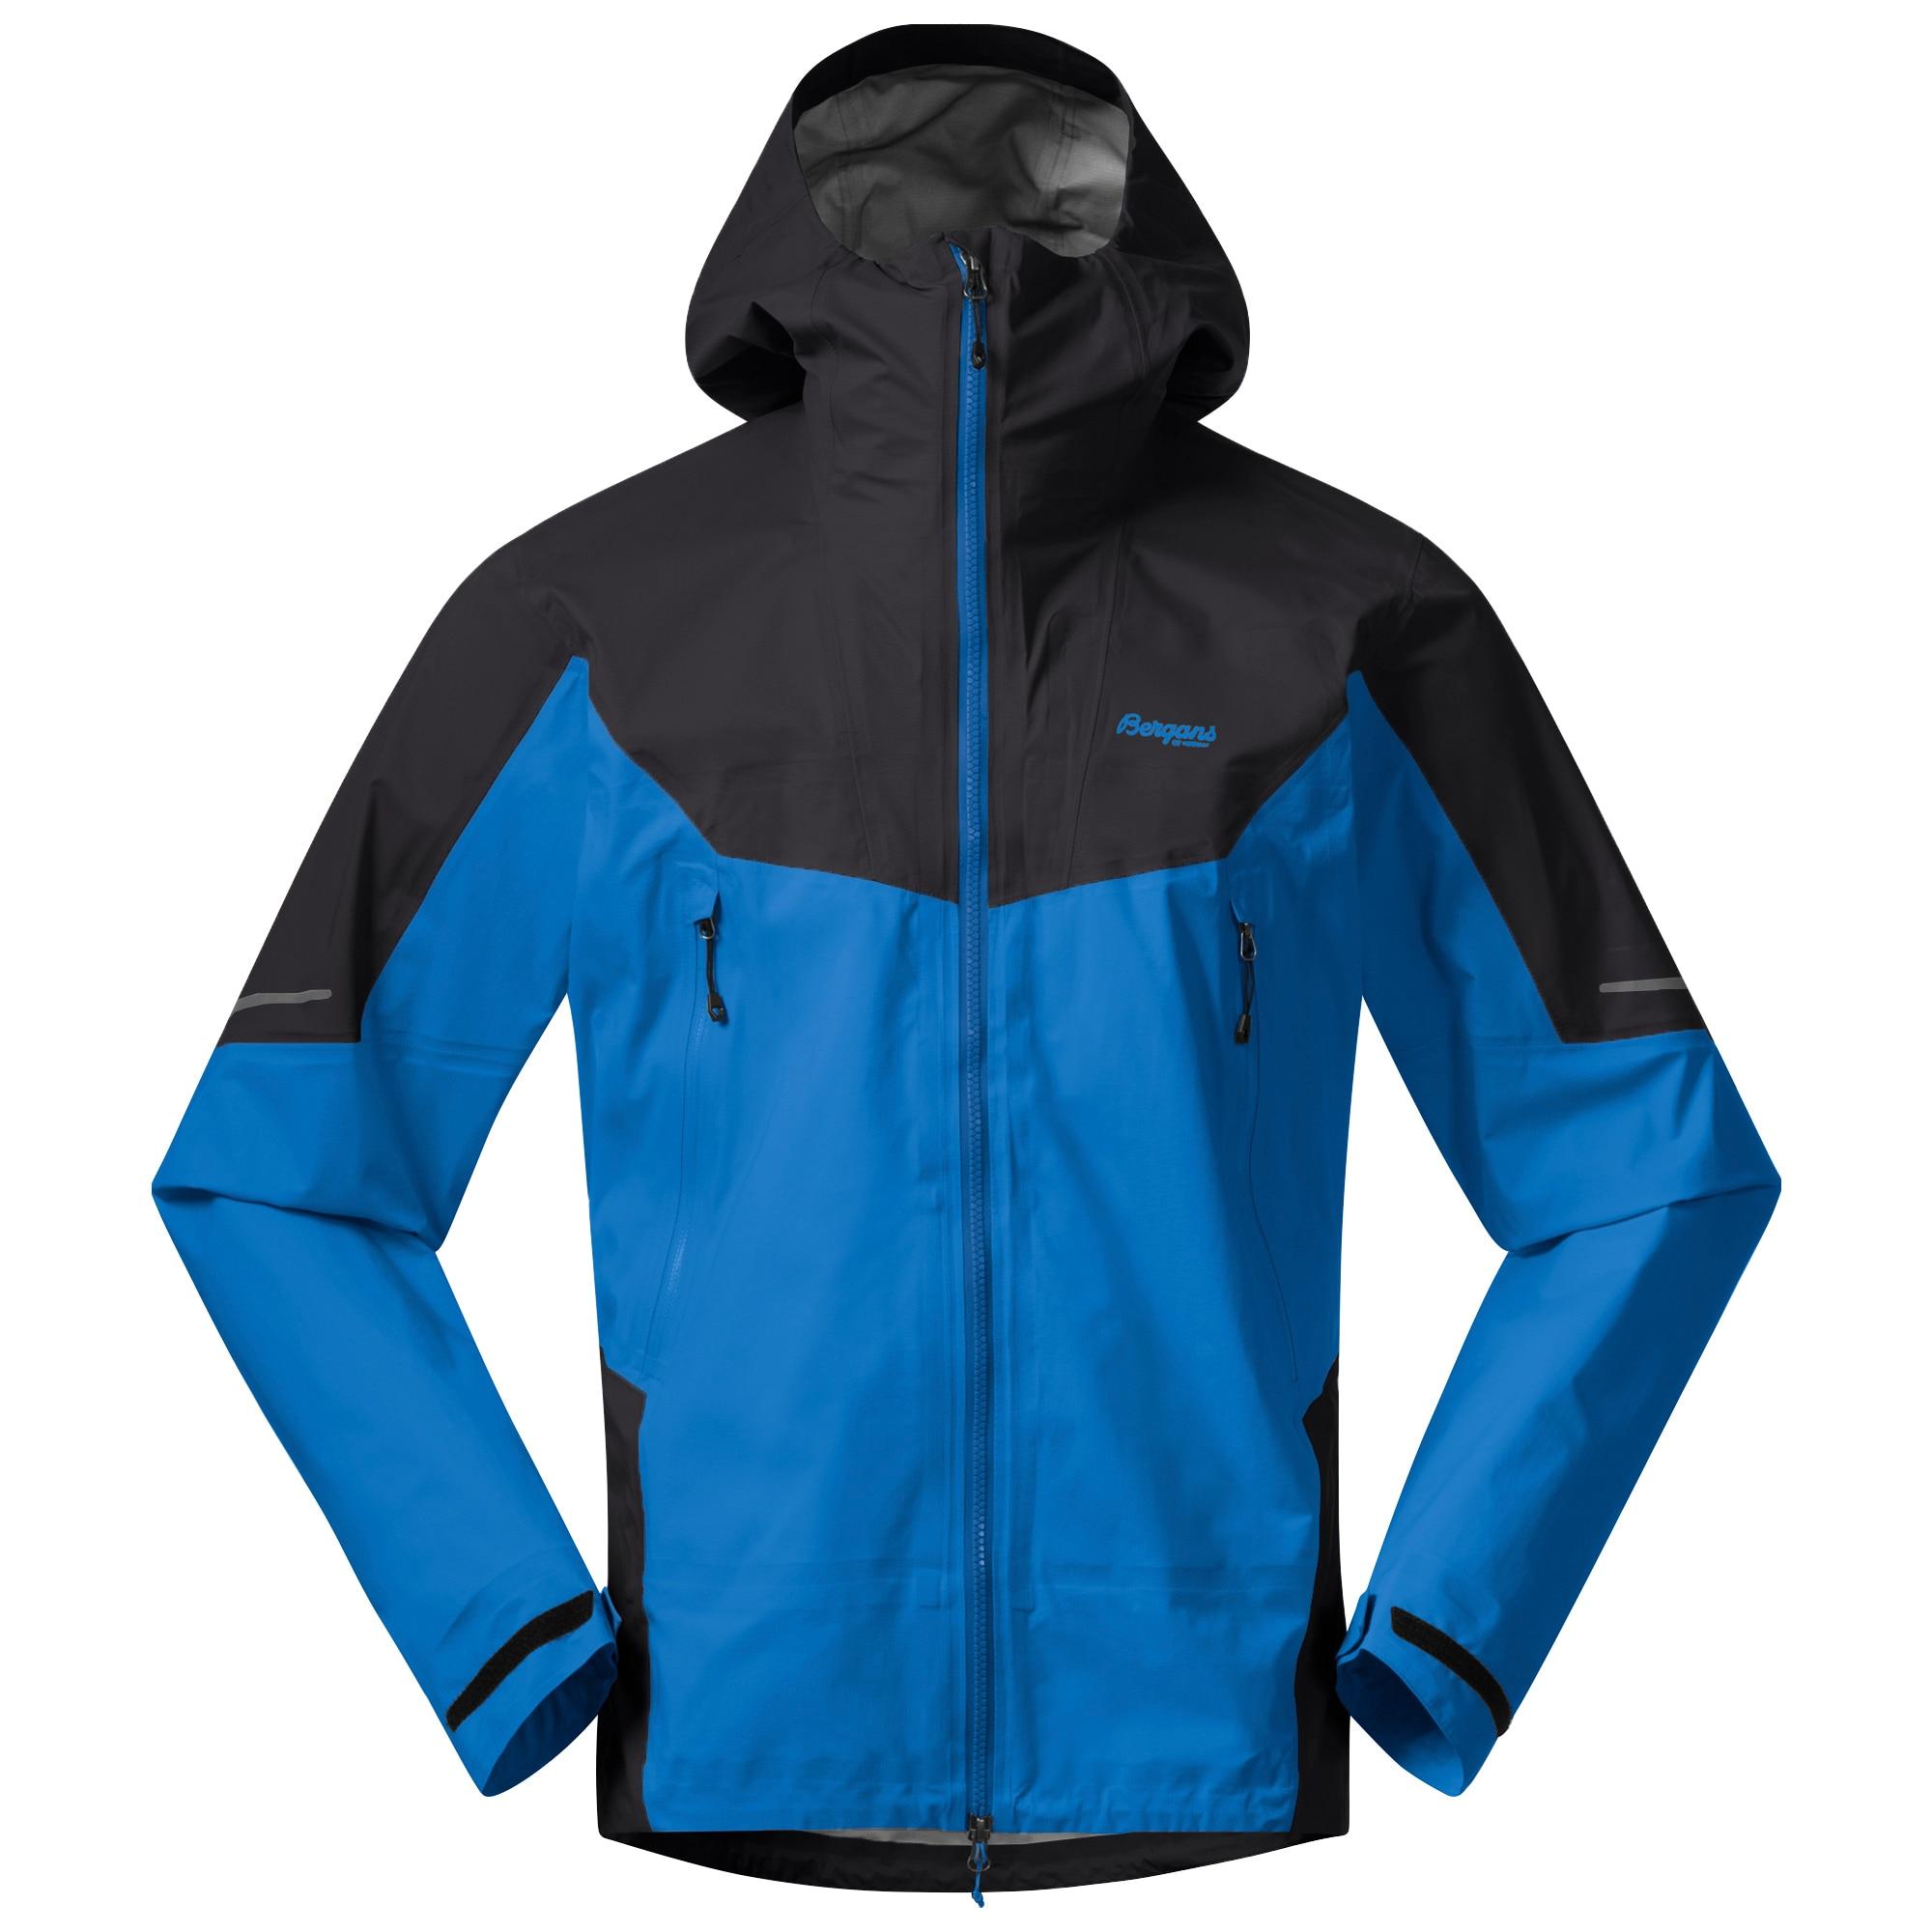 Senja 3L Jacket